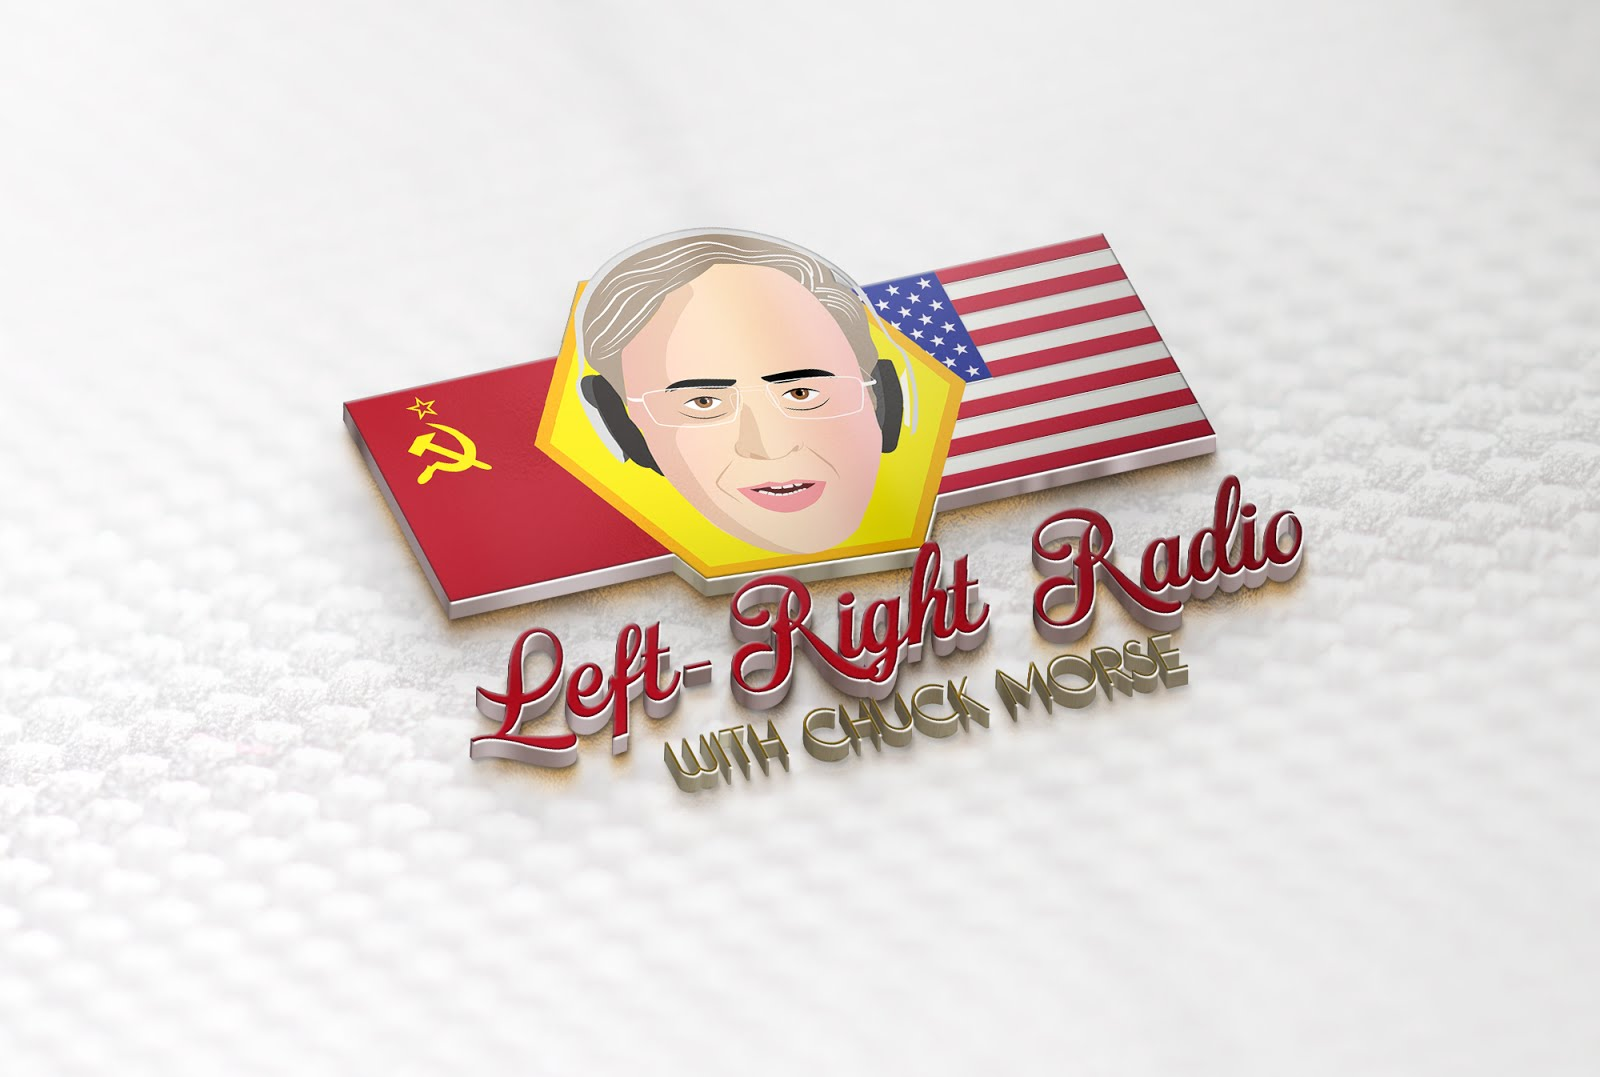 Left-Right Radio with Chuck Morse